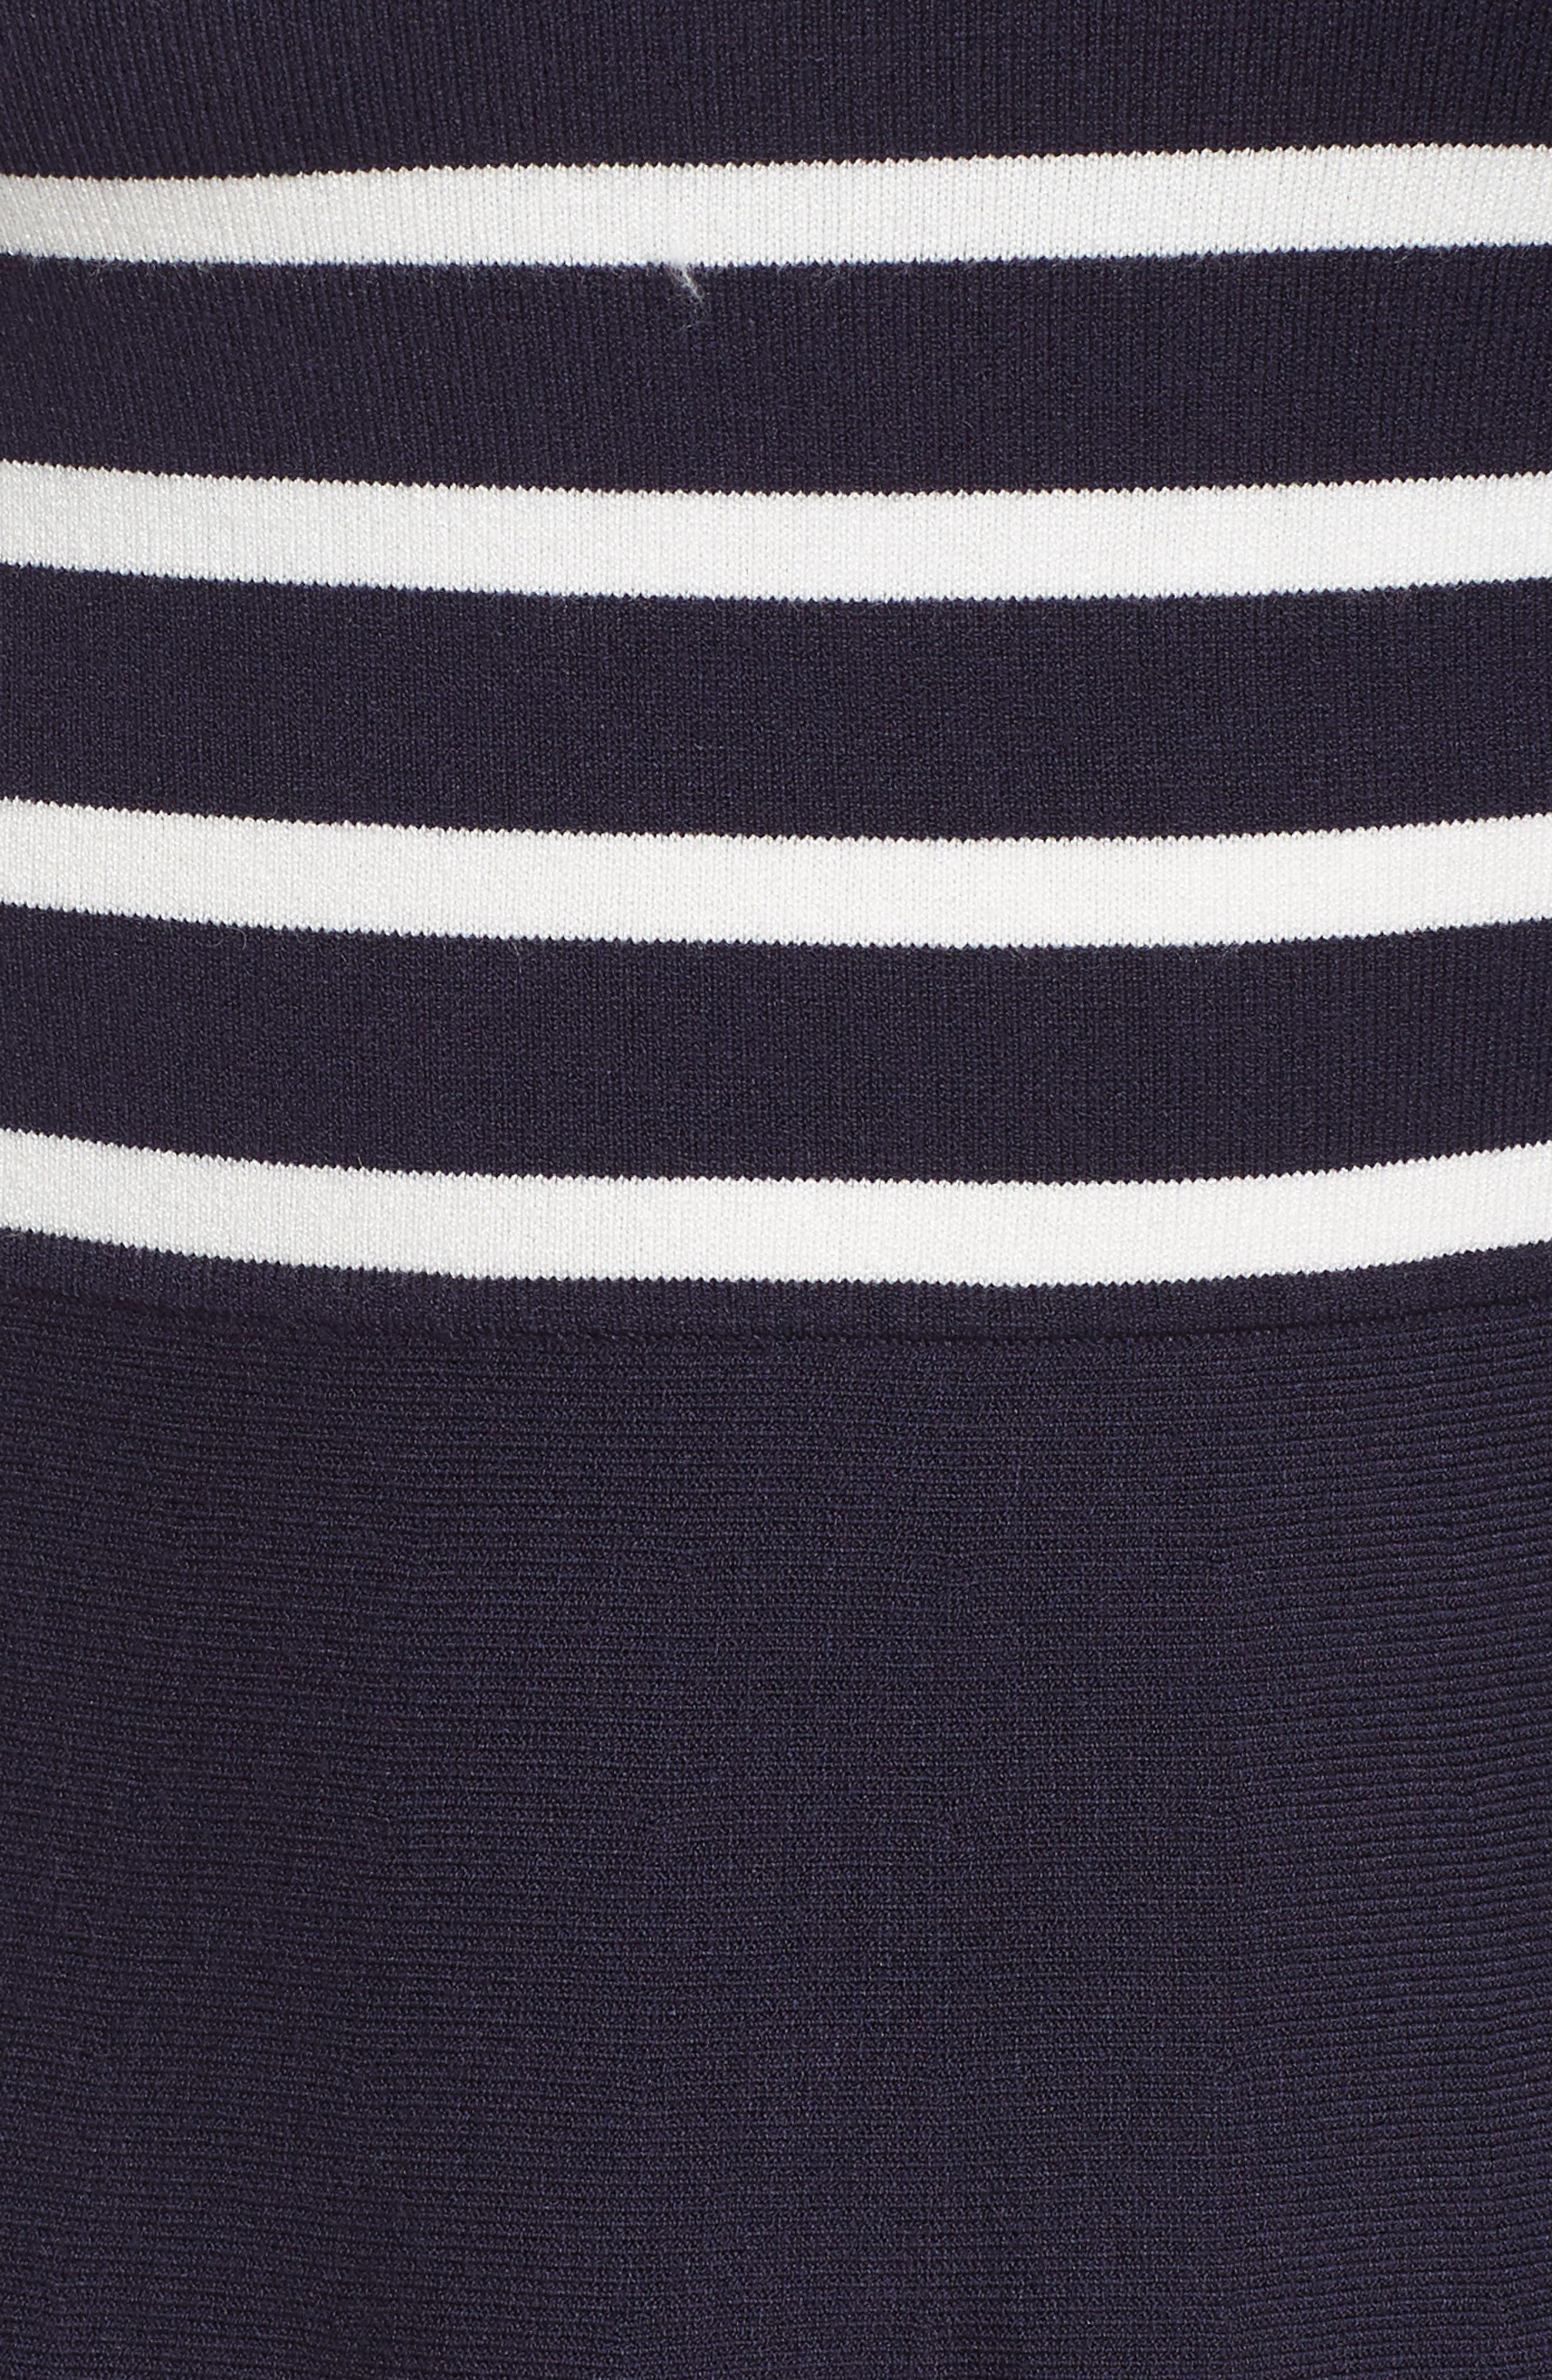 Stripe Mock Neck Fit & Flare Dress,                             Alternate thumbnail 5, color,                             NAVY